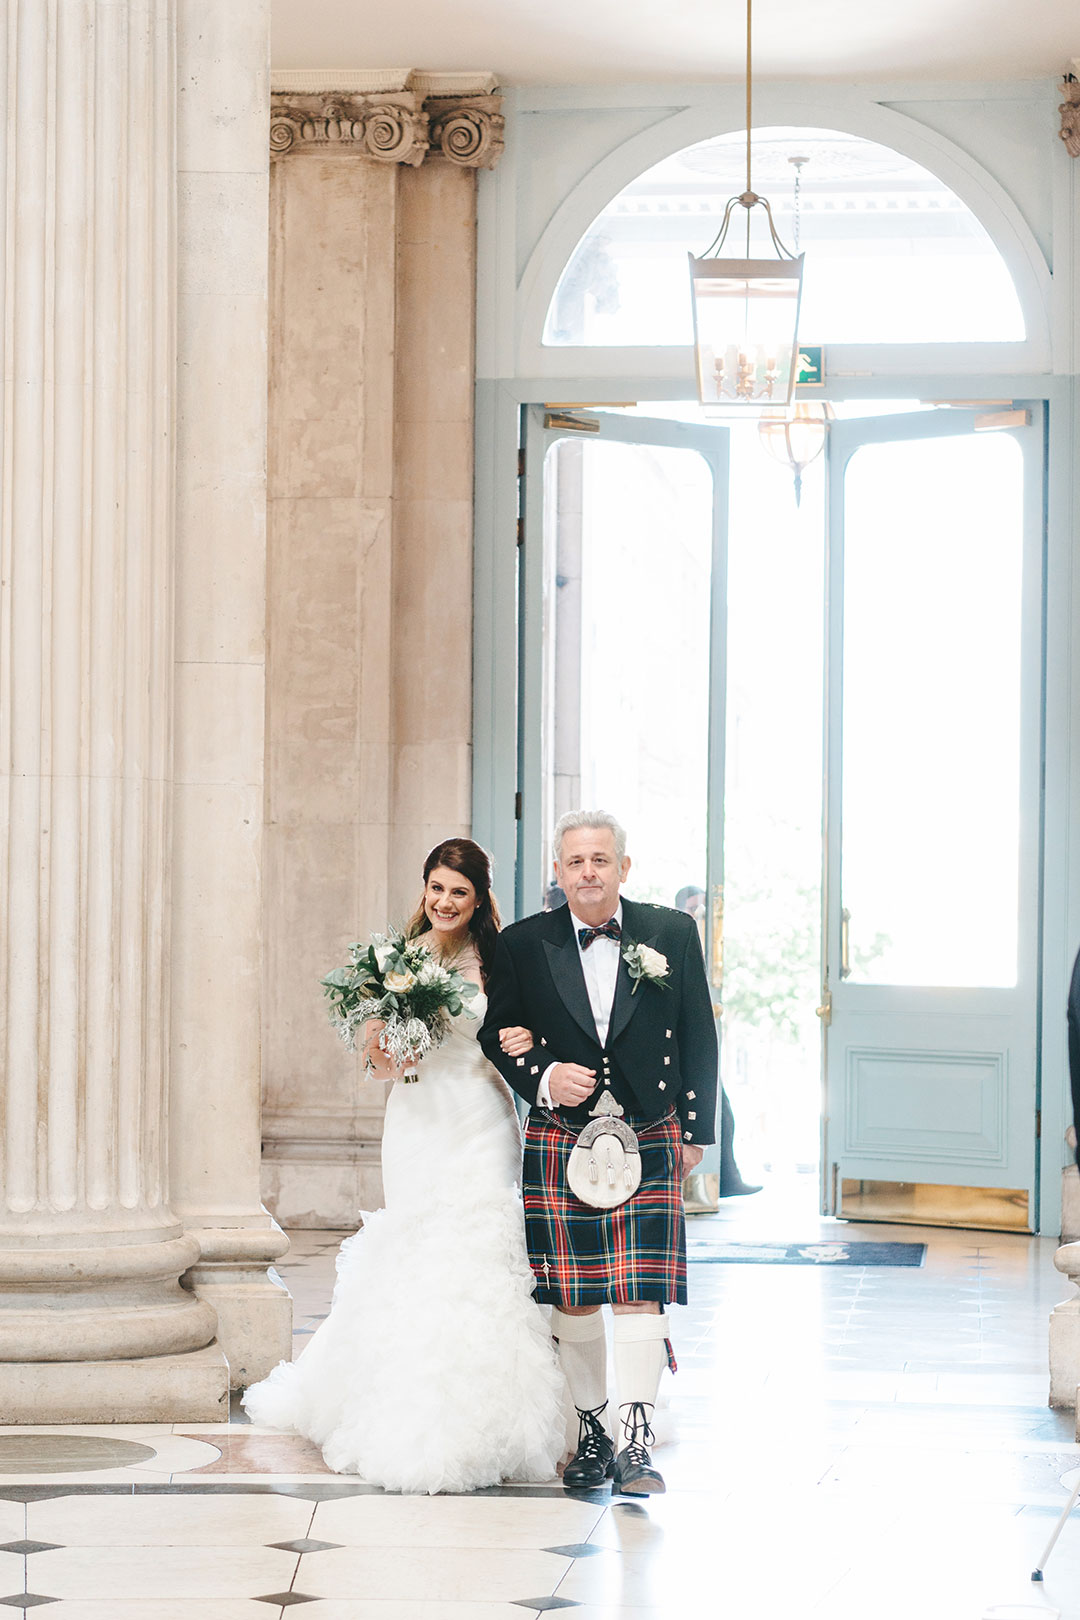 bellinter-house-wedding-photographer-0044_0044.jpg